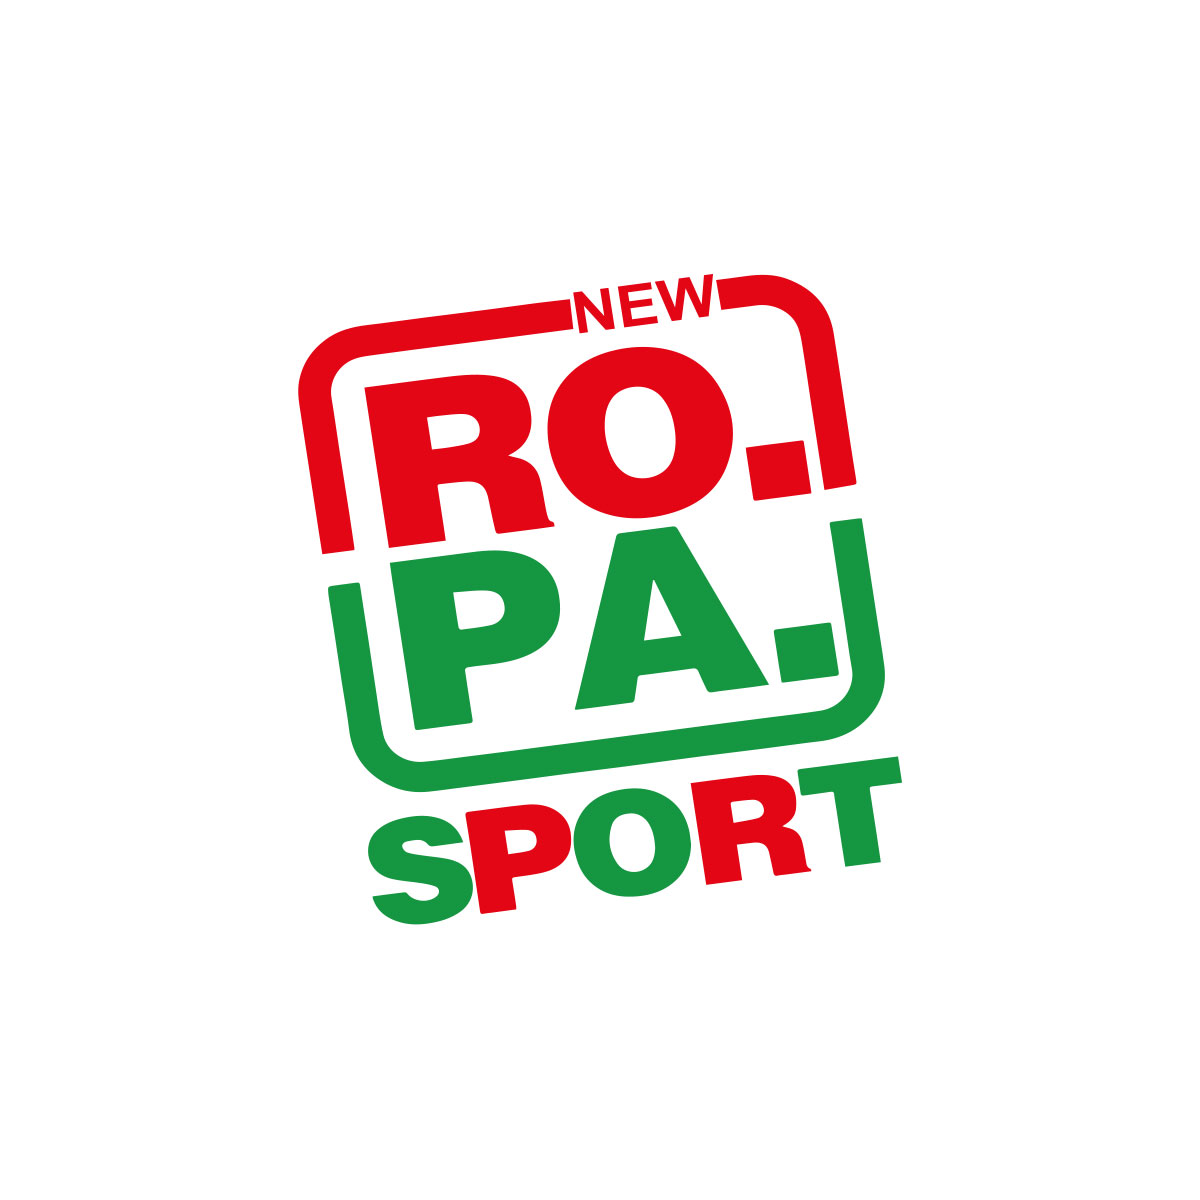 new ropa sport logo